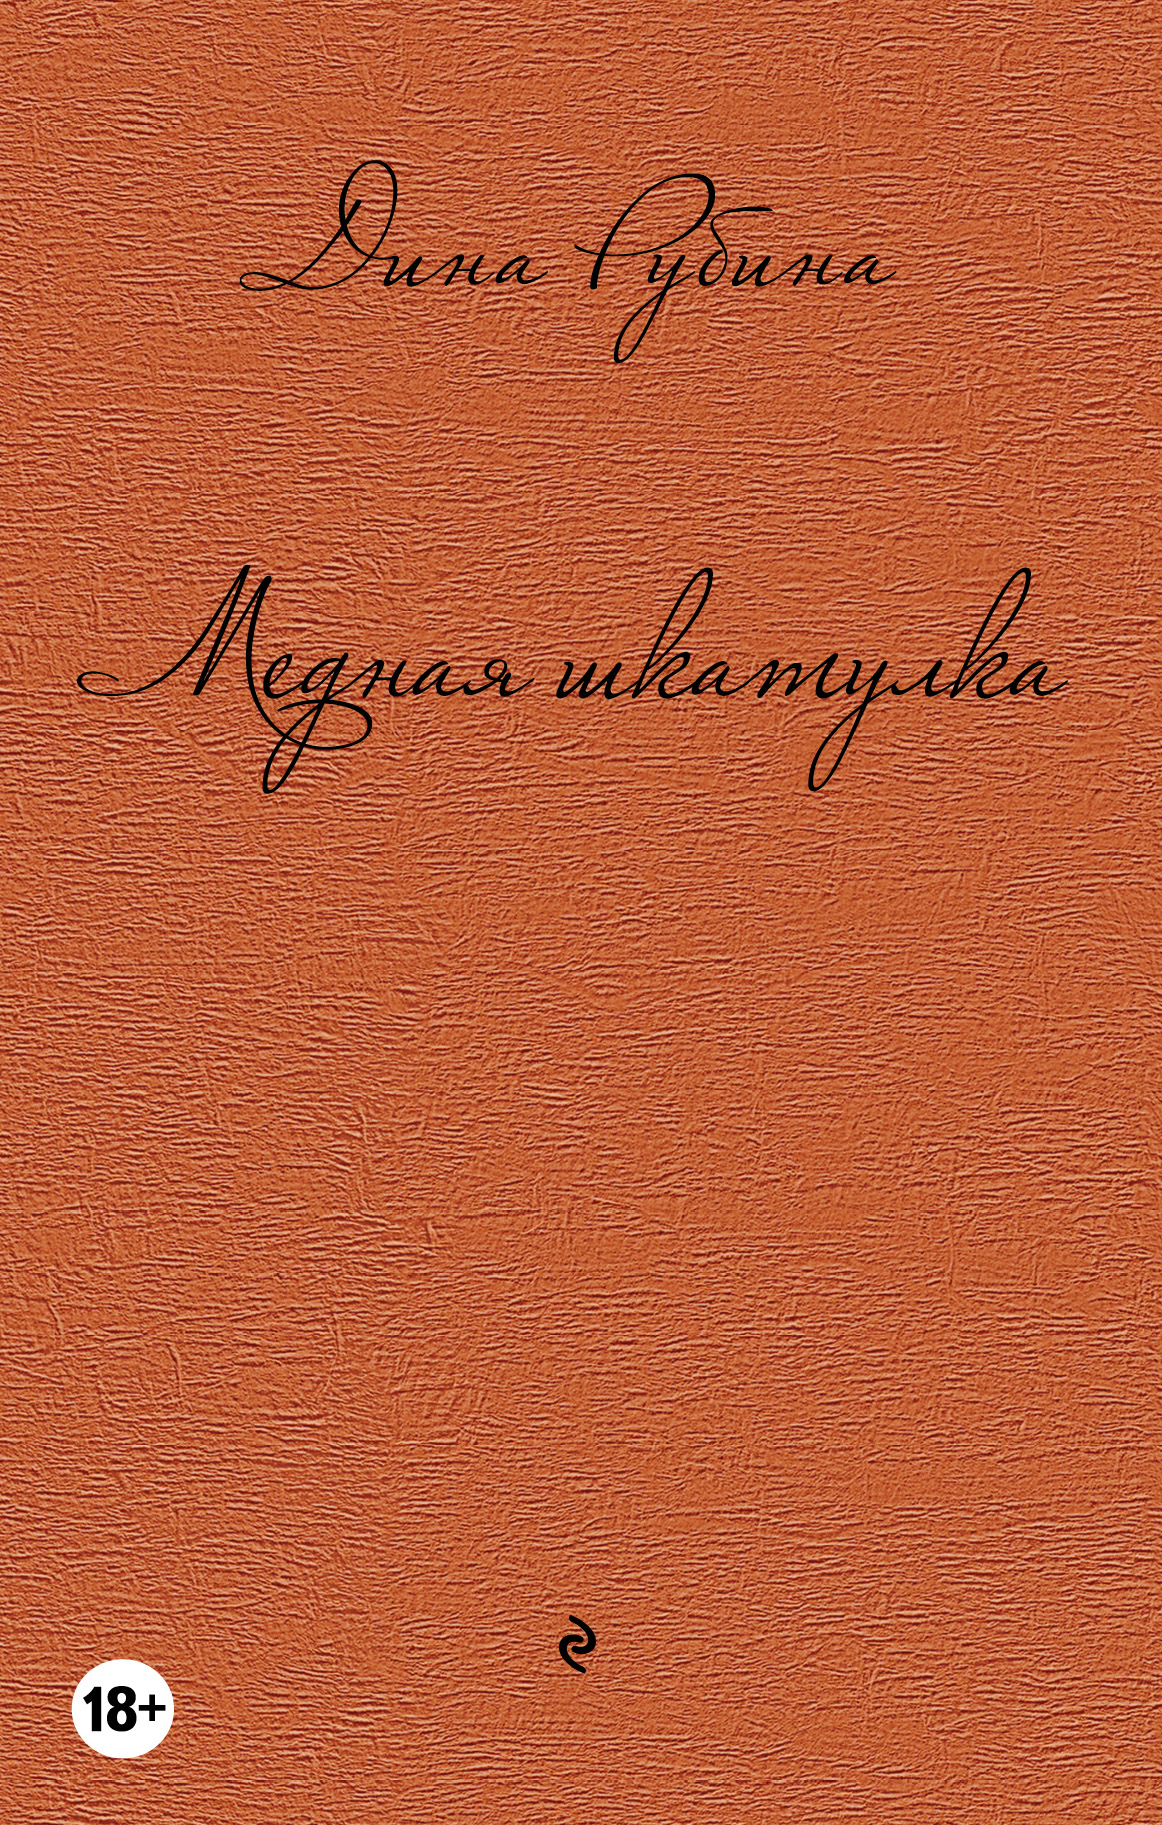 Дина Рубина Медная шкатулка (сборник) дина рубина медная шкатулка сборник